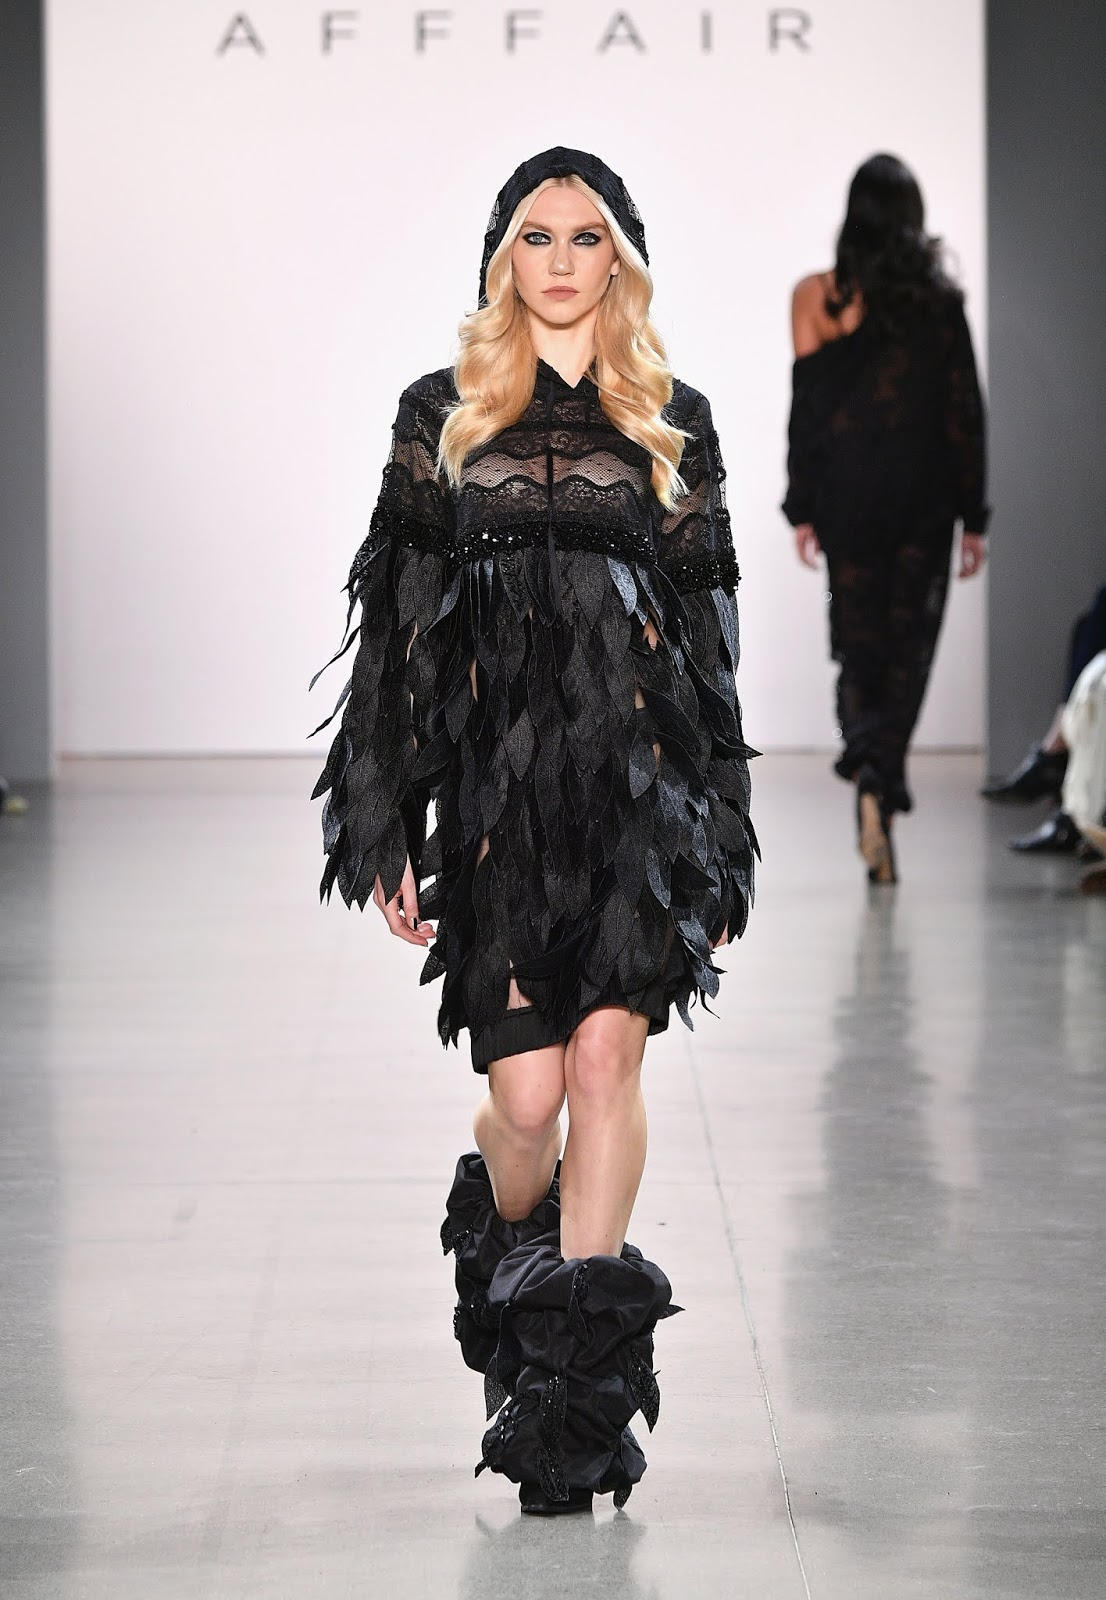 AFFFAIR - NYFW by Mari Estilo-fashion week-spring studio-look of the day-it girl-dcblogger-